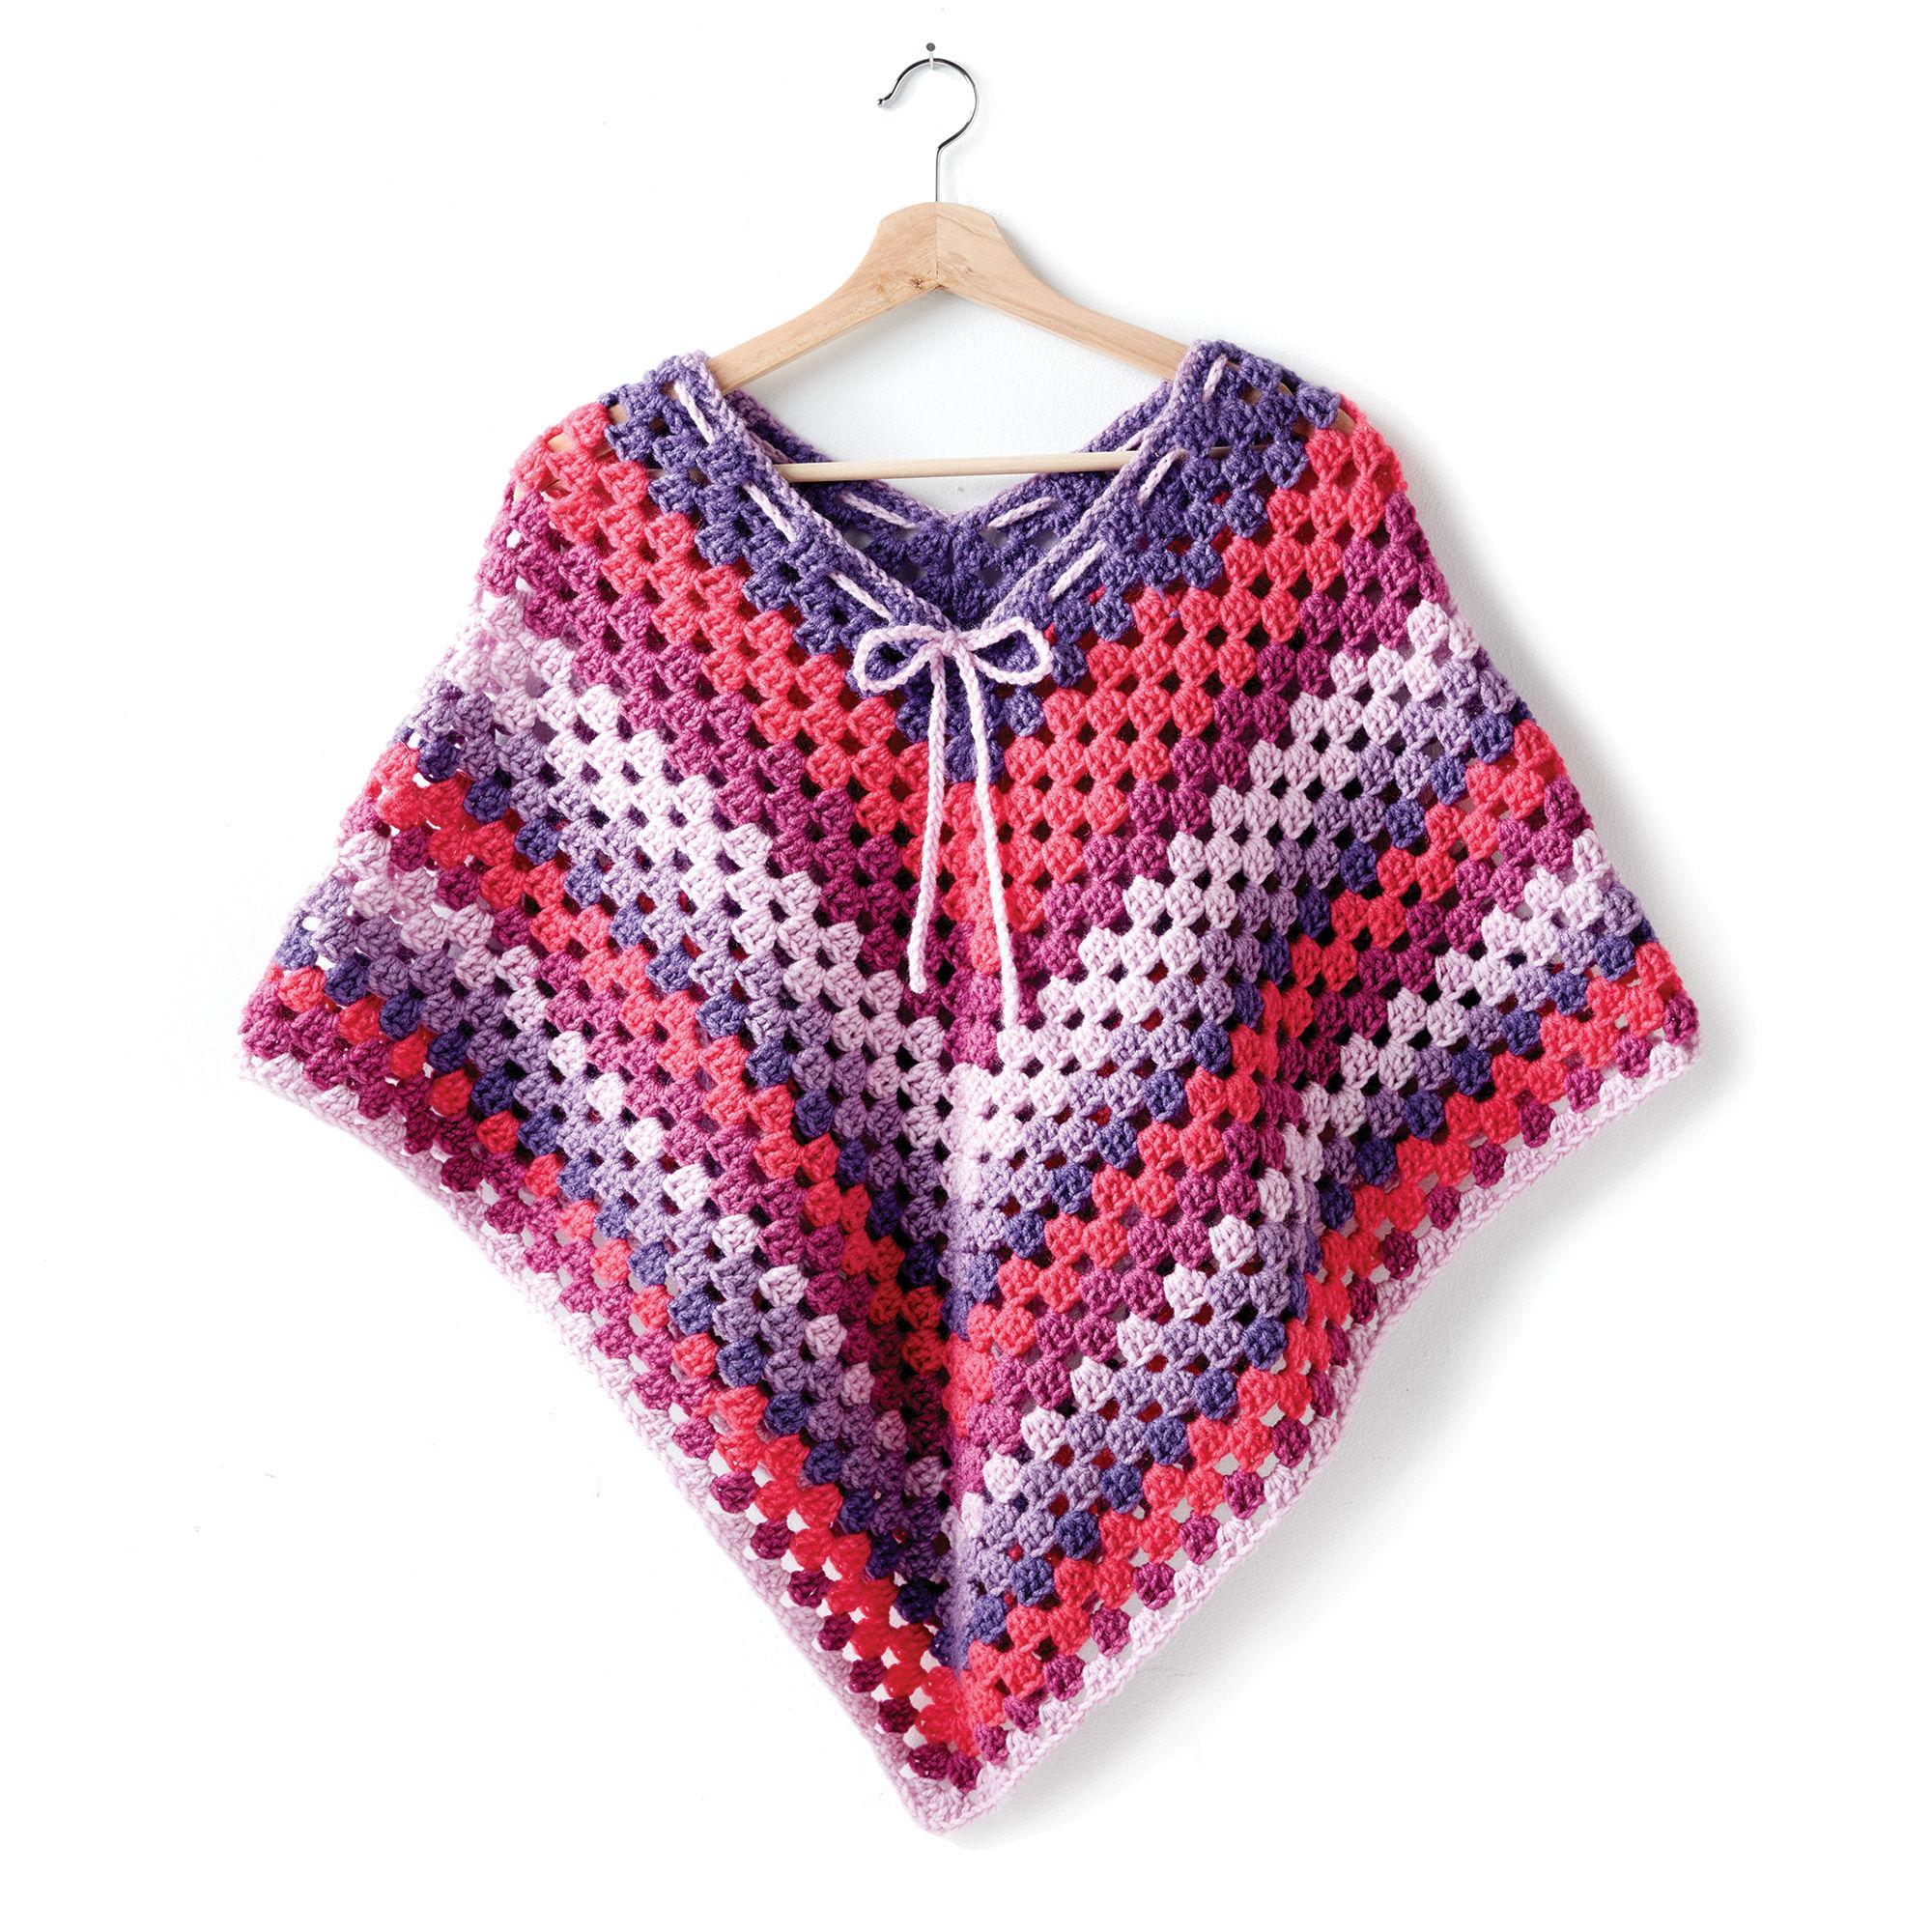 Bernat Girl's Crochet Poncho | Yarnspirations